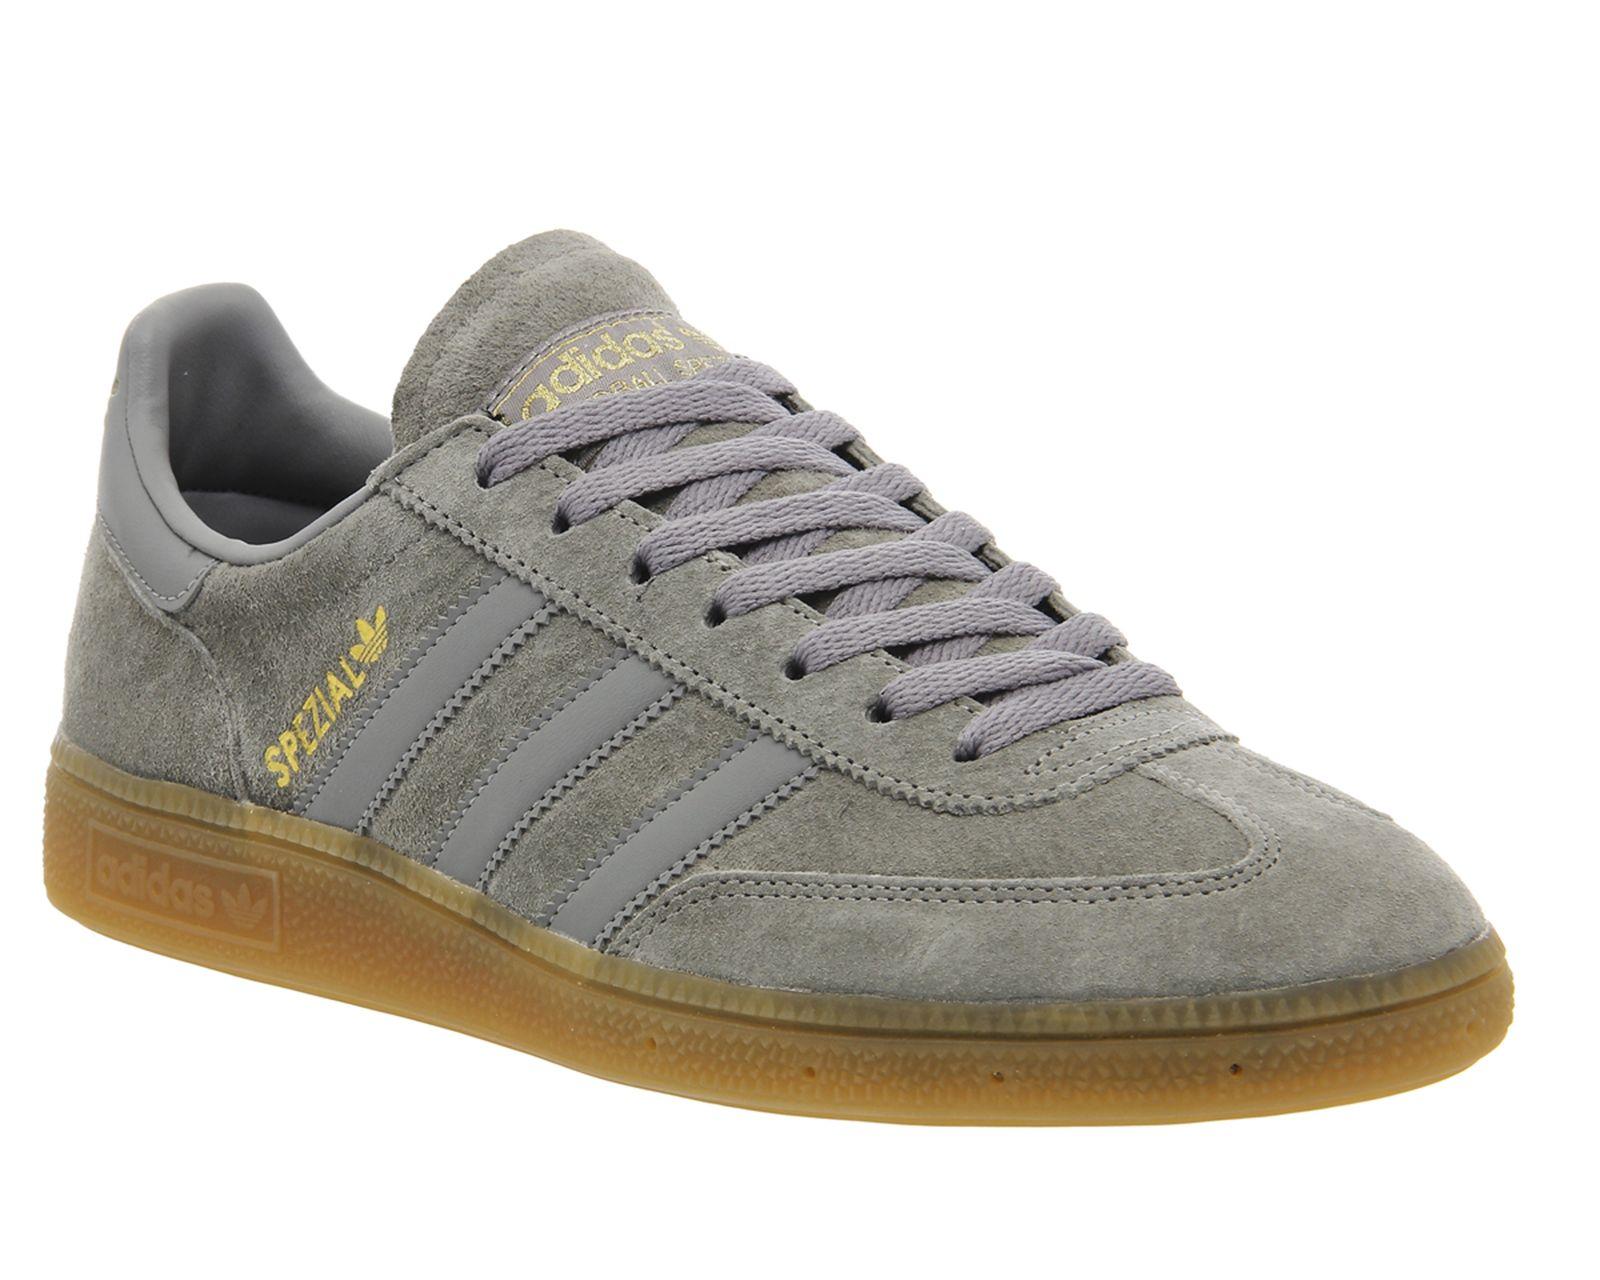 promo code 6db89 a8101 Adidas Spezial Grey